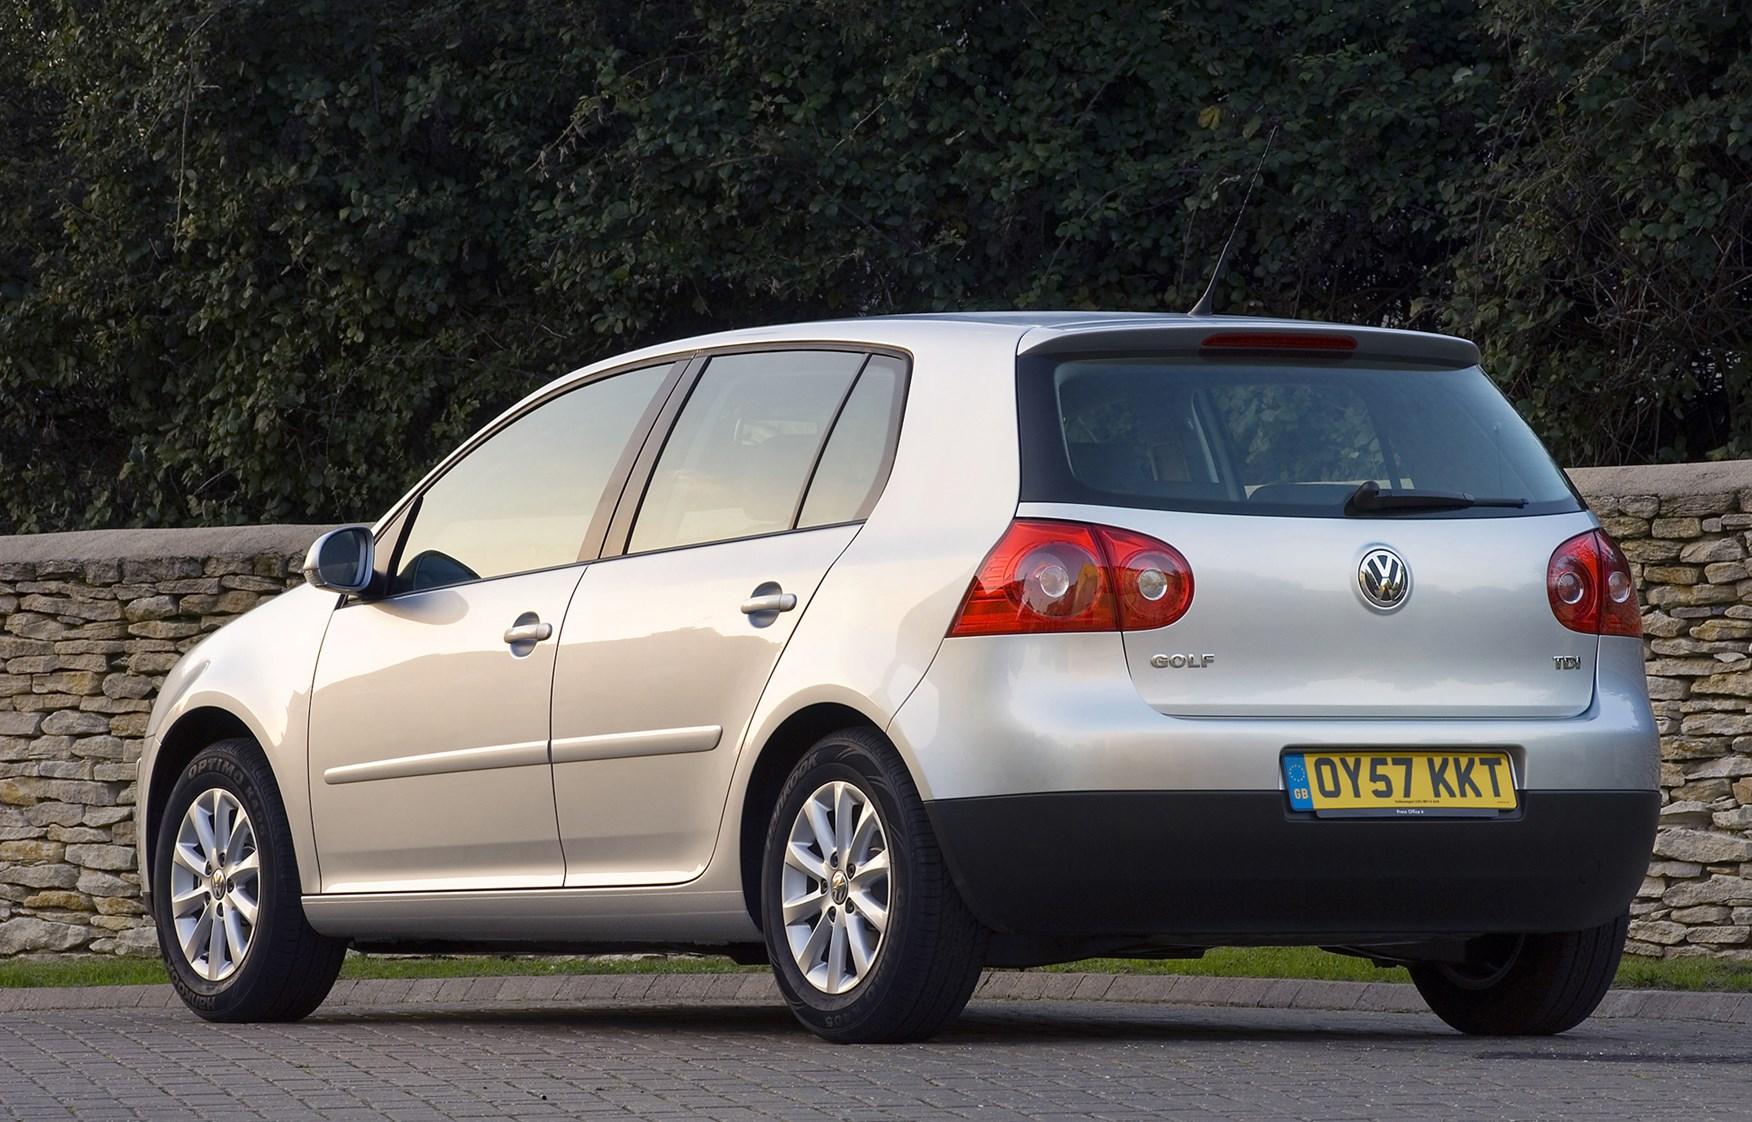 Used Volkswagen Golf Hatchback (2004 - 2008) Review | Parkers